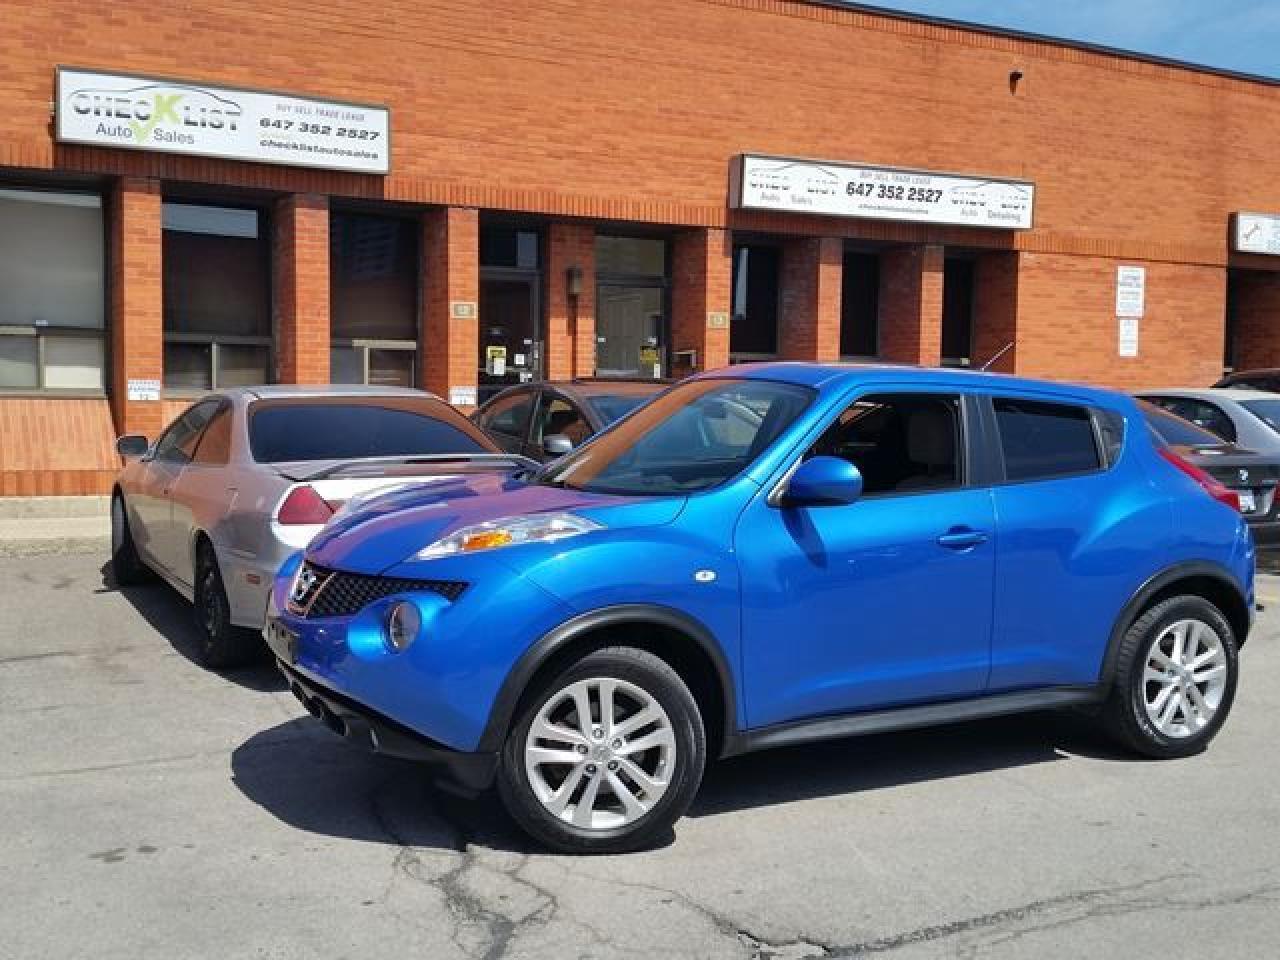 Photo of Blue 2012 Nissan Juke